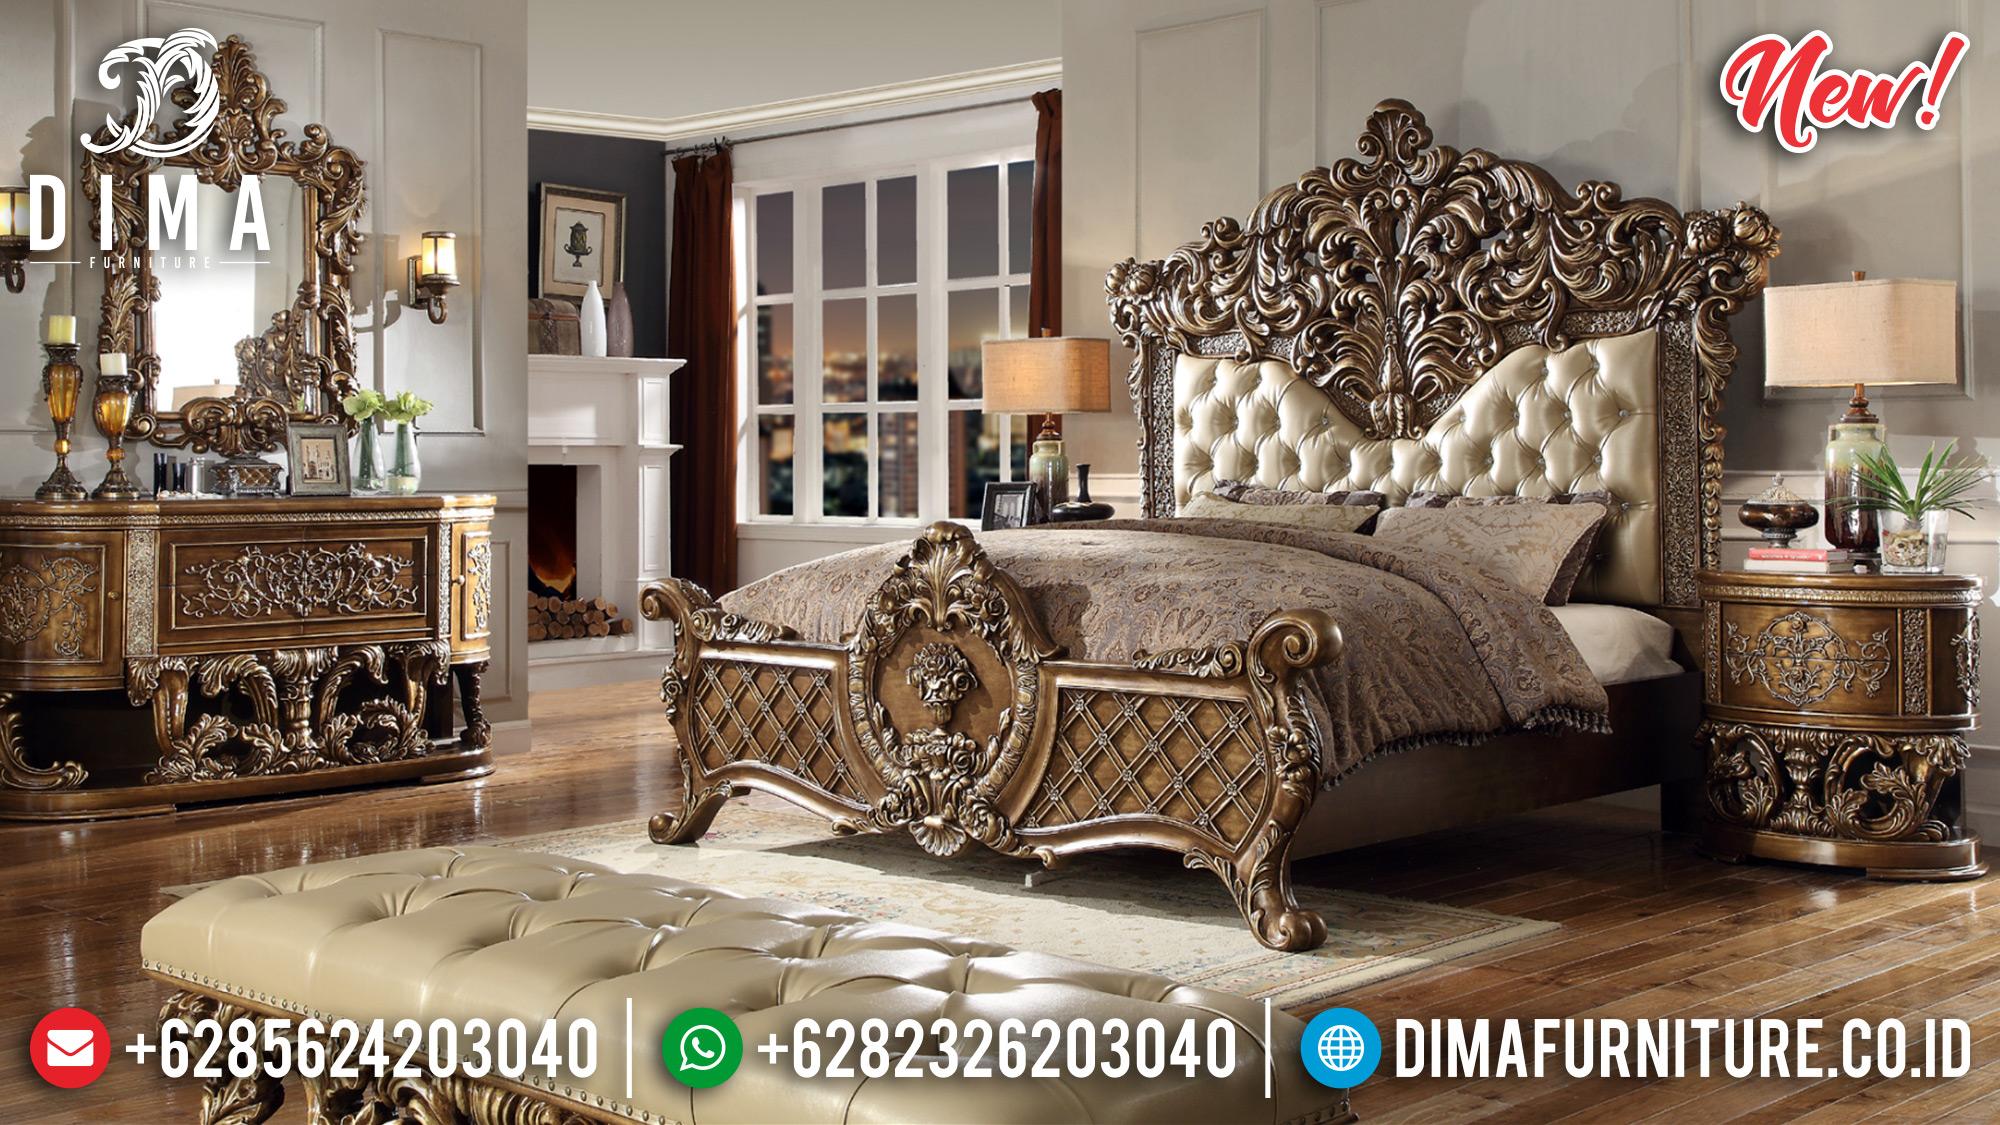 Jual Tempat Tidur Ukiran Mewah Warna Gold Glossy BT-0174